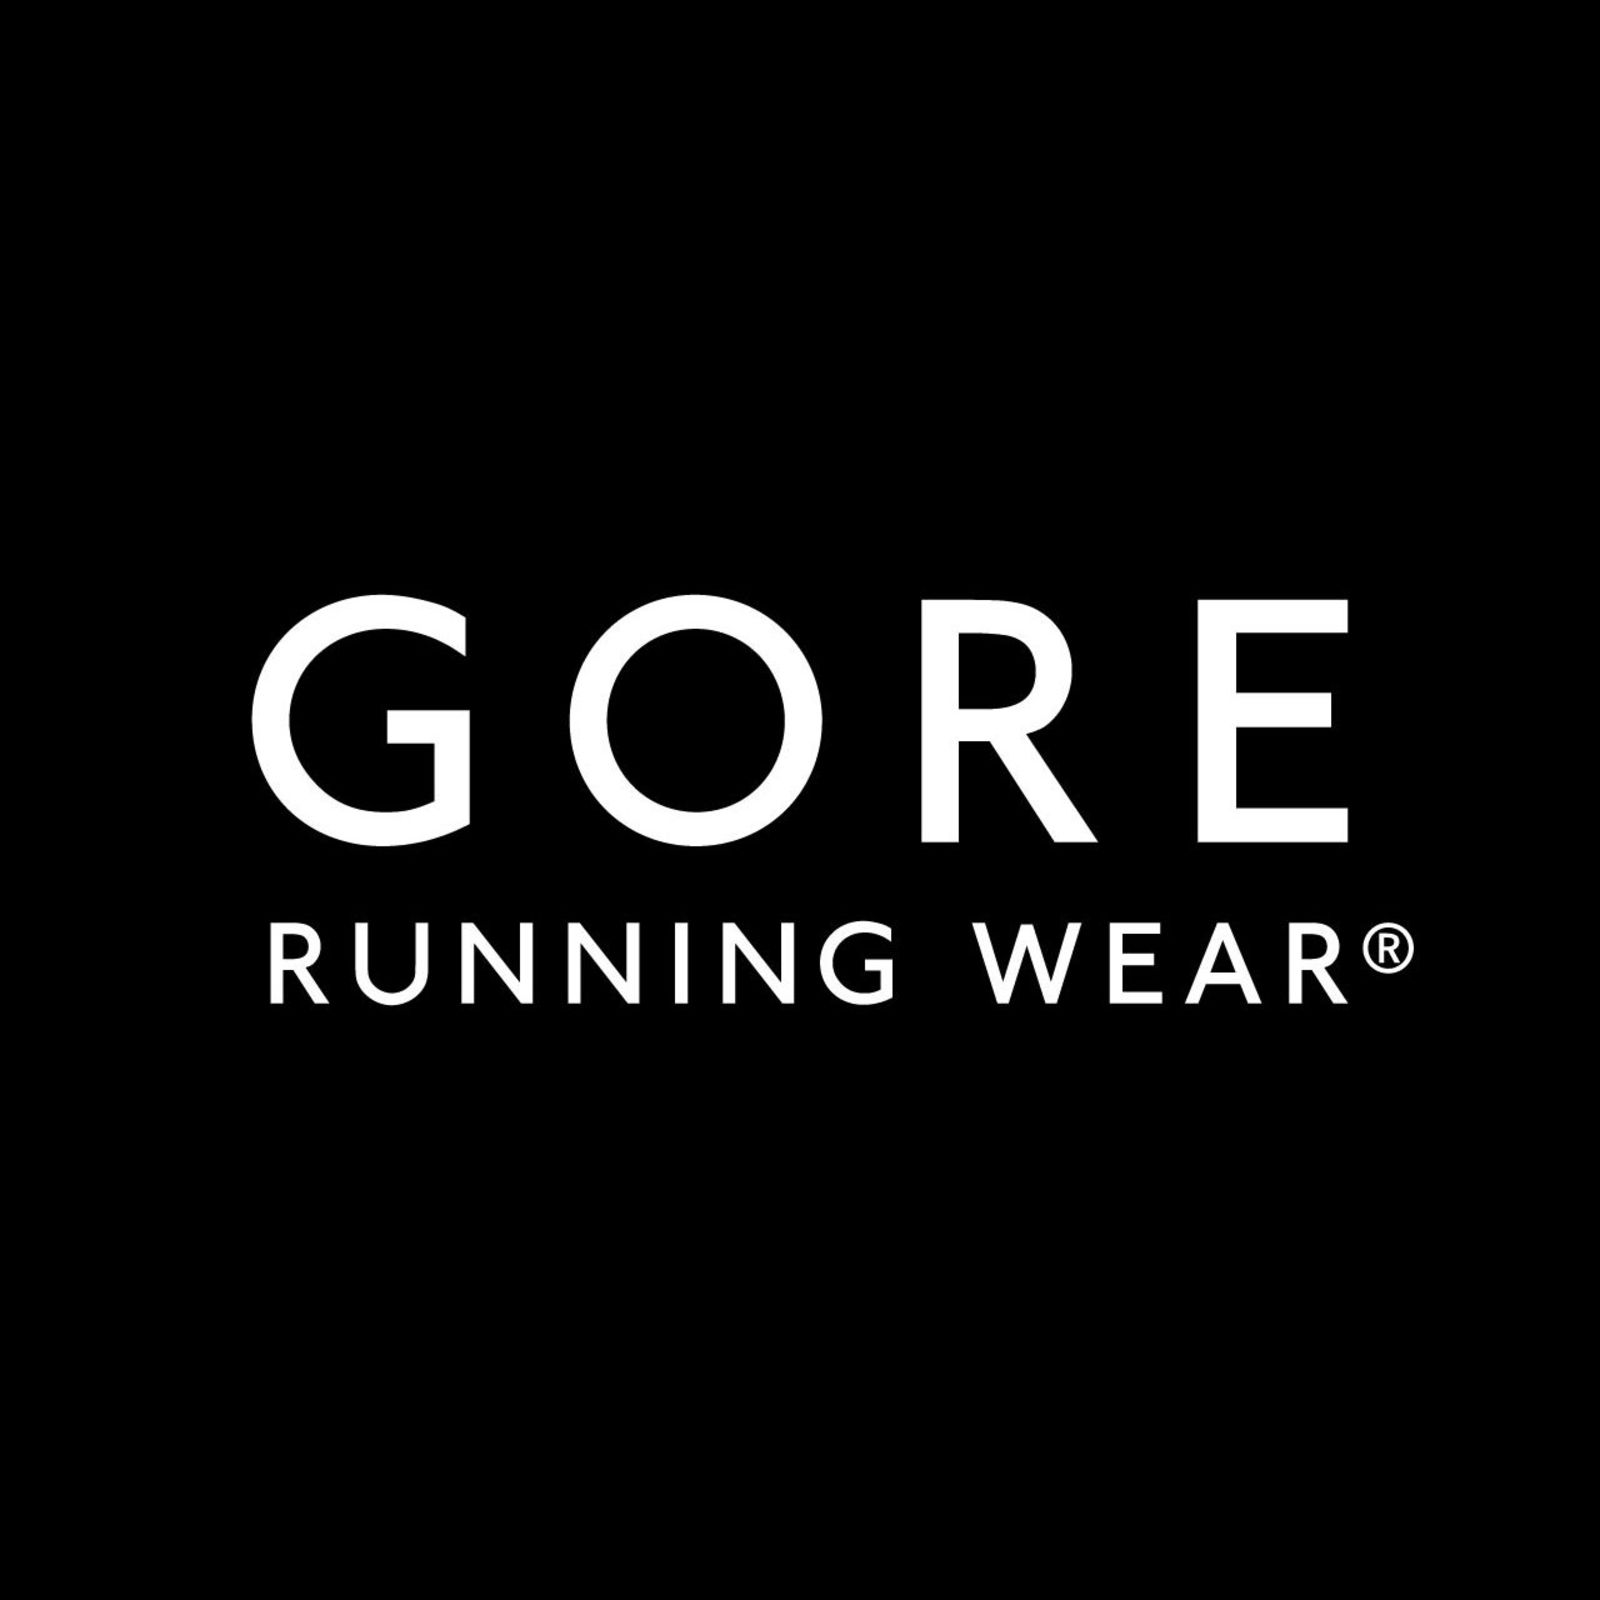 GORE RUNNING WEAR®